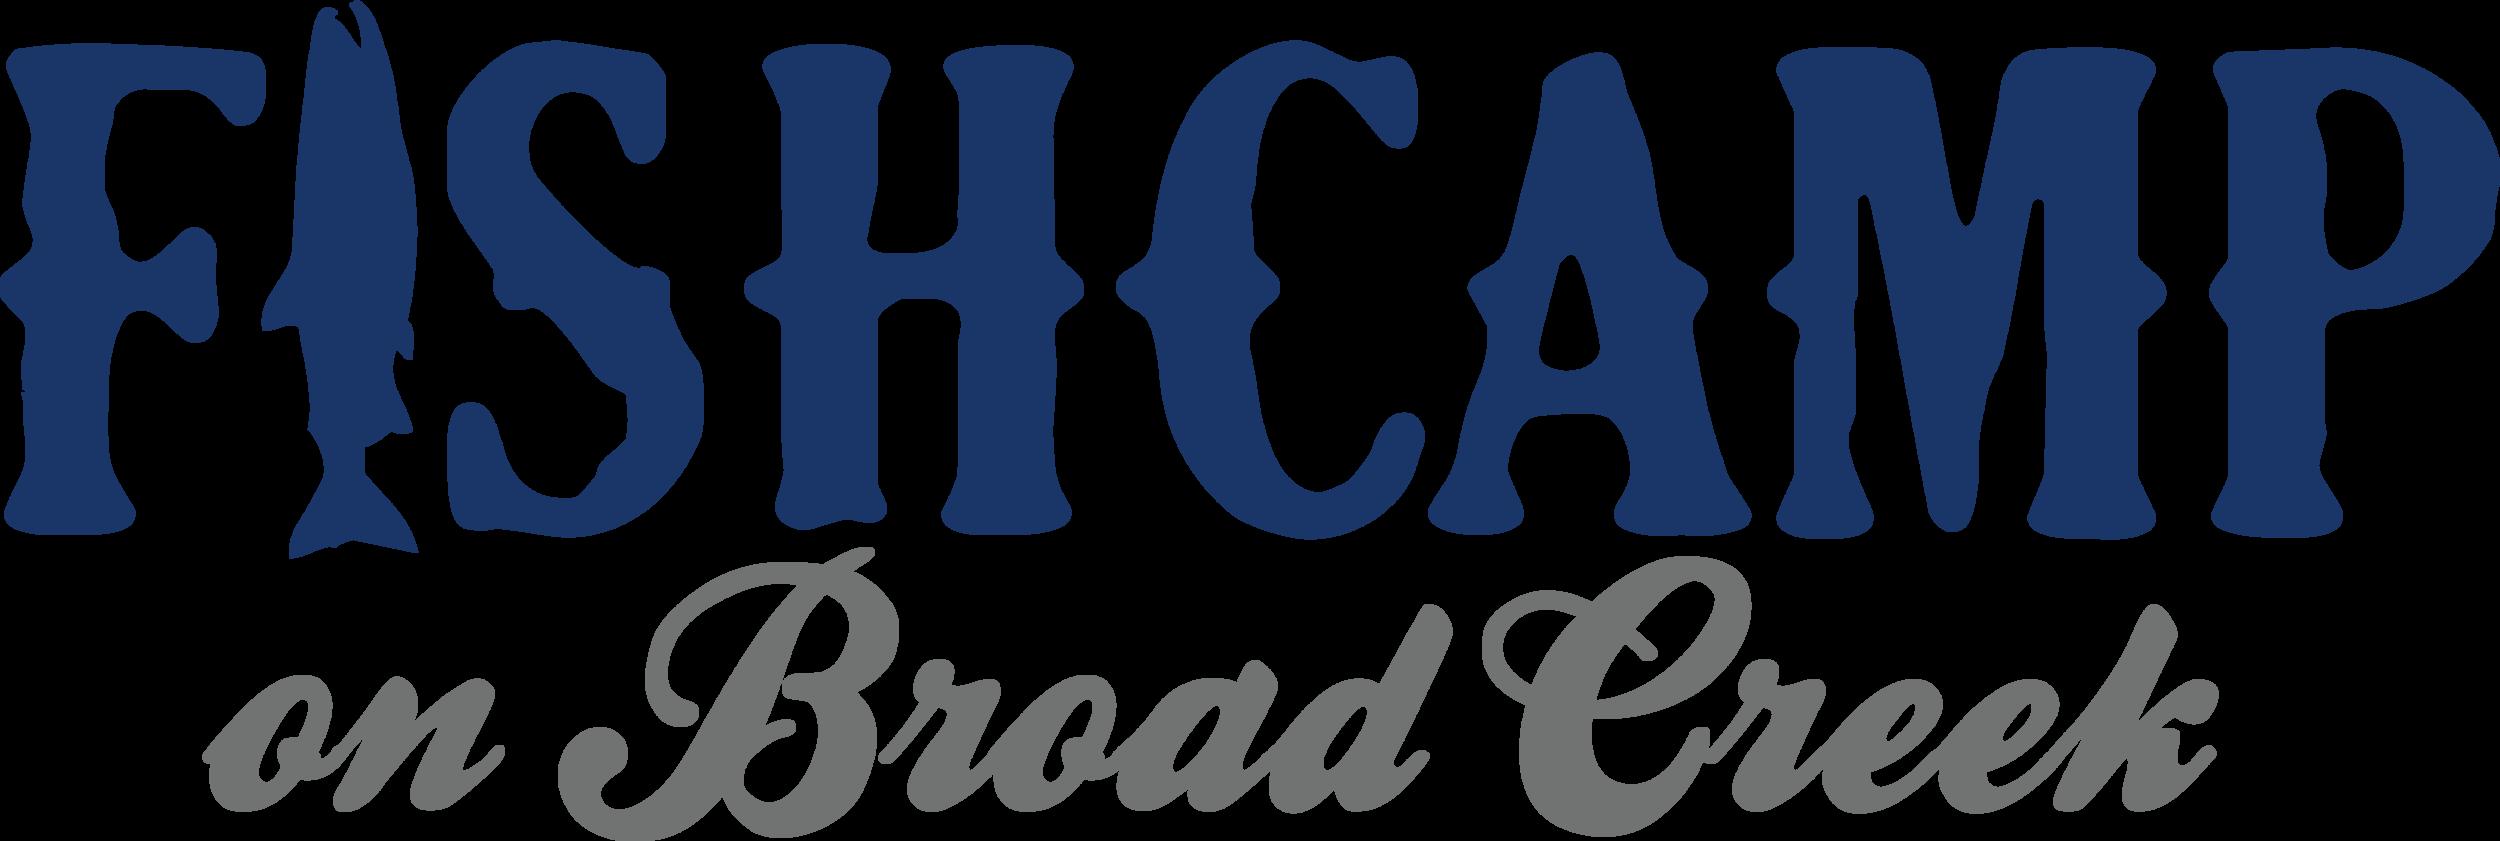 fishcamp-broad-creek-hilton-head-waterfront-restaurant.png